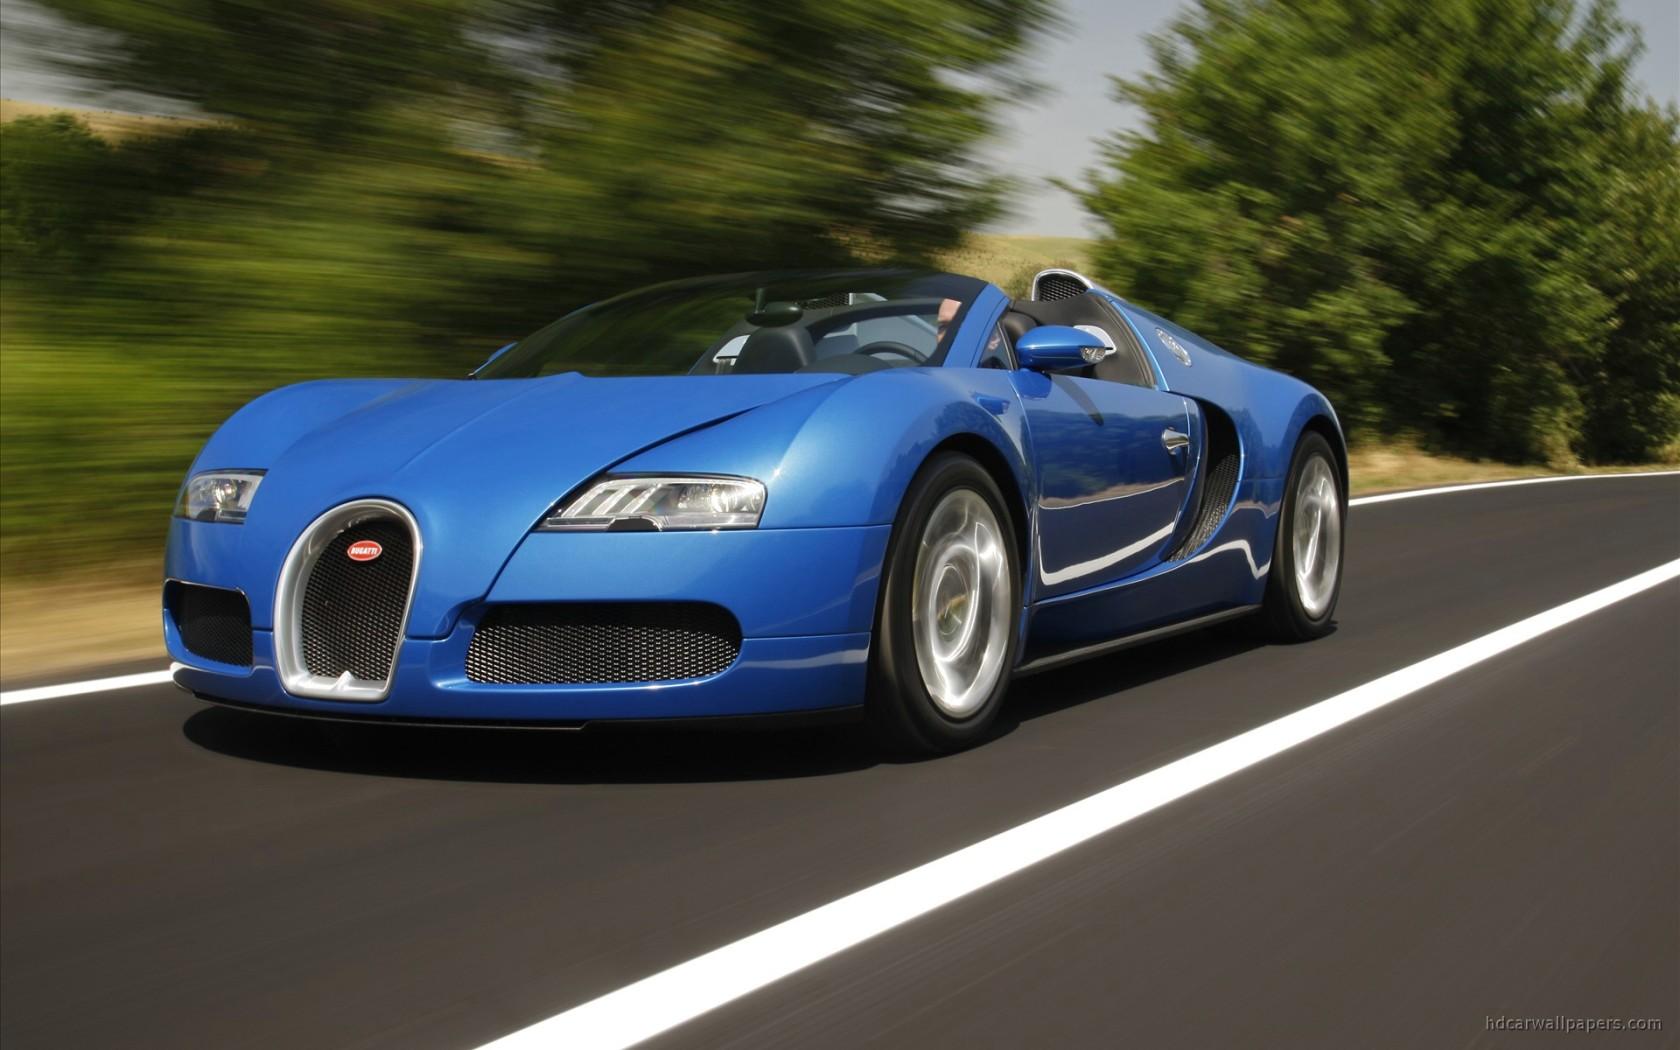 Bugatti Veyron Grand Sport Hd Wallpaper: 2010 Bugatti Veyron Grand Sport Rome Wallpaper